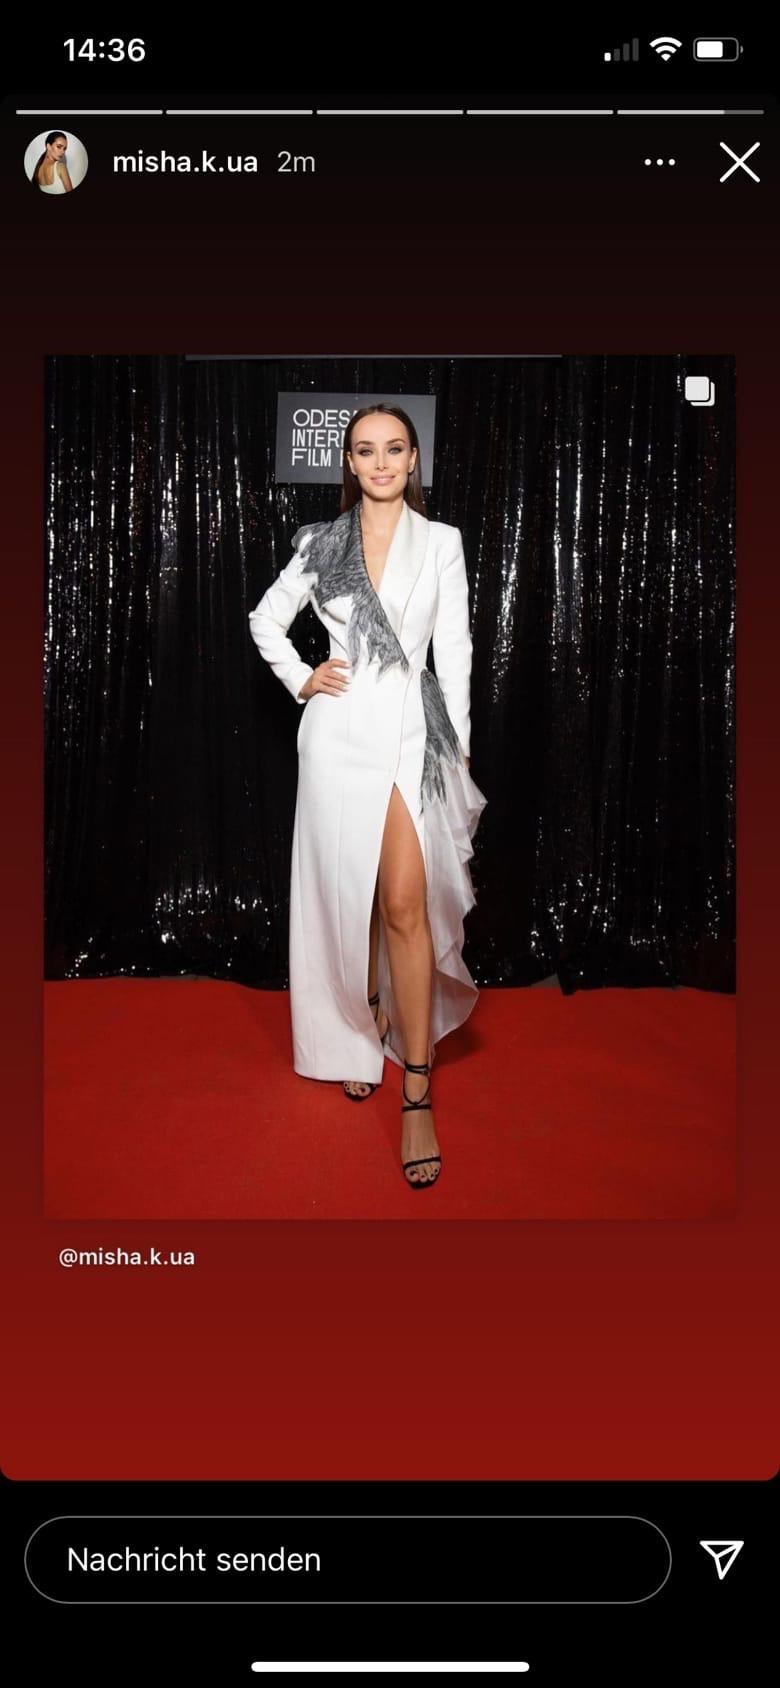 Ksenia Mishina - Sasha Ellert - Bachelorette Ukraine -  Season 1 - Discussion  - Page 12 YSk3iLwXb4s